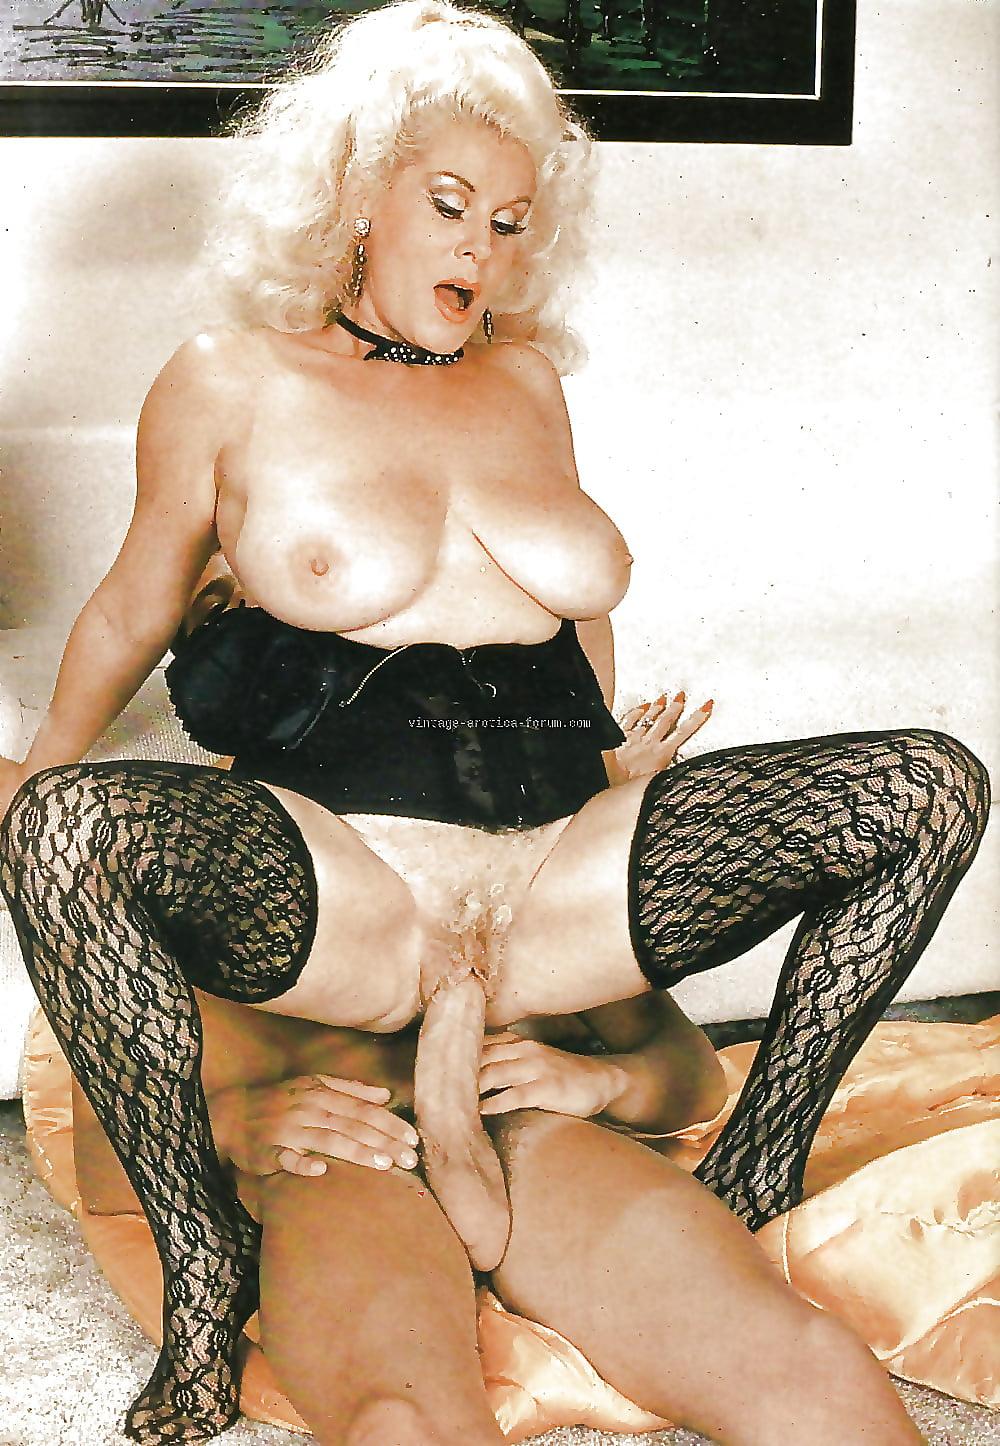 Vintage granny porn pictures hair